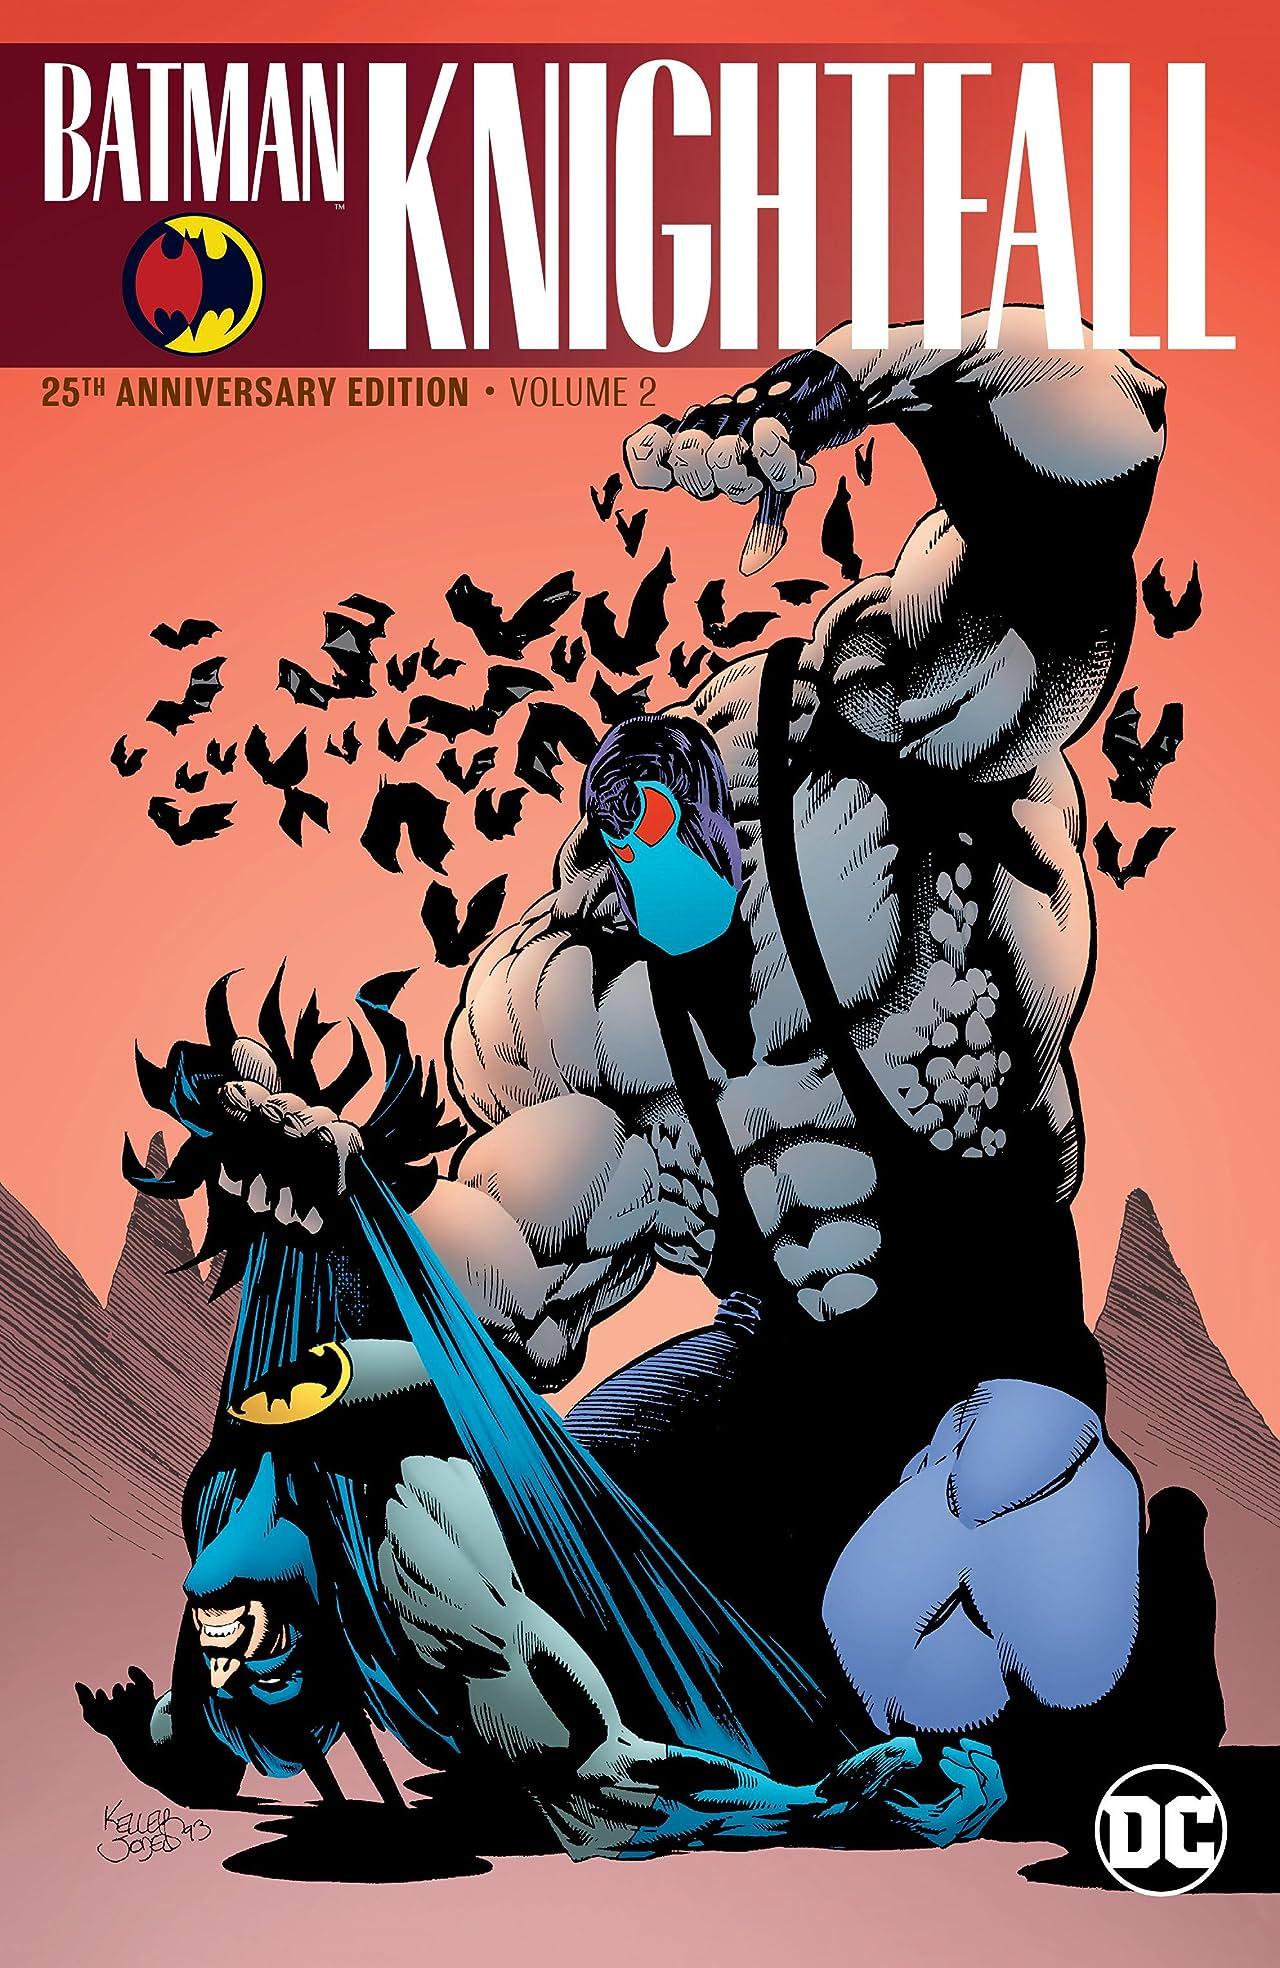 Batman: Knightfall Vol. 2: (25th Anniversary Edition)